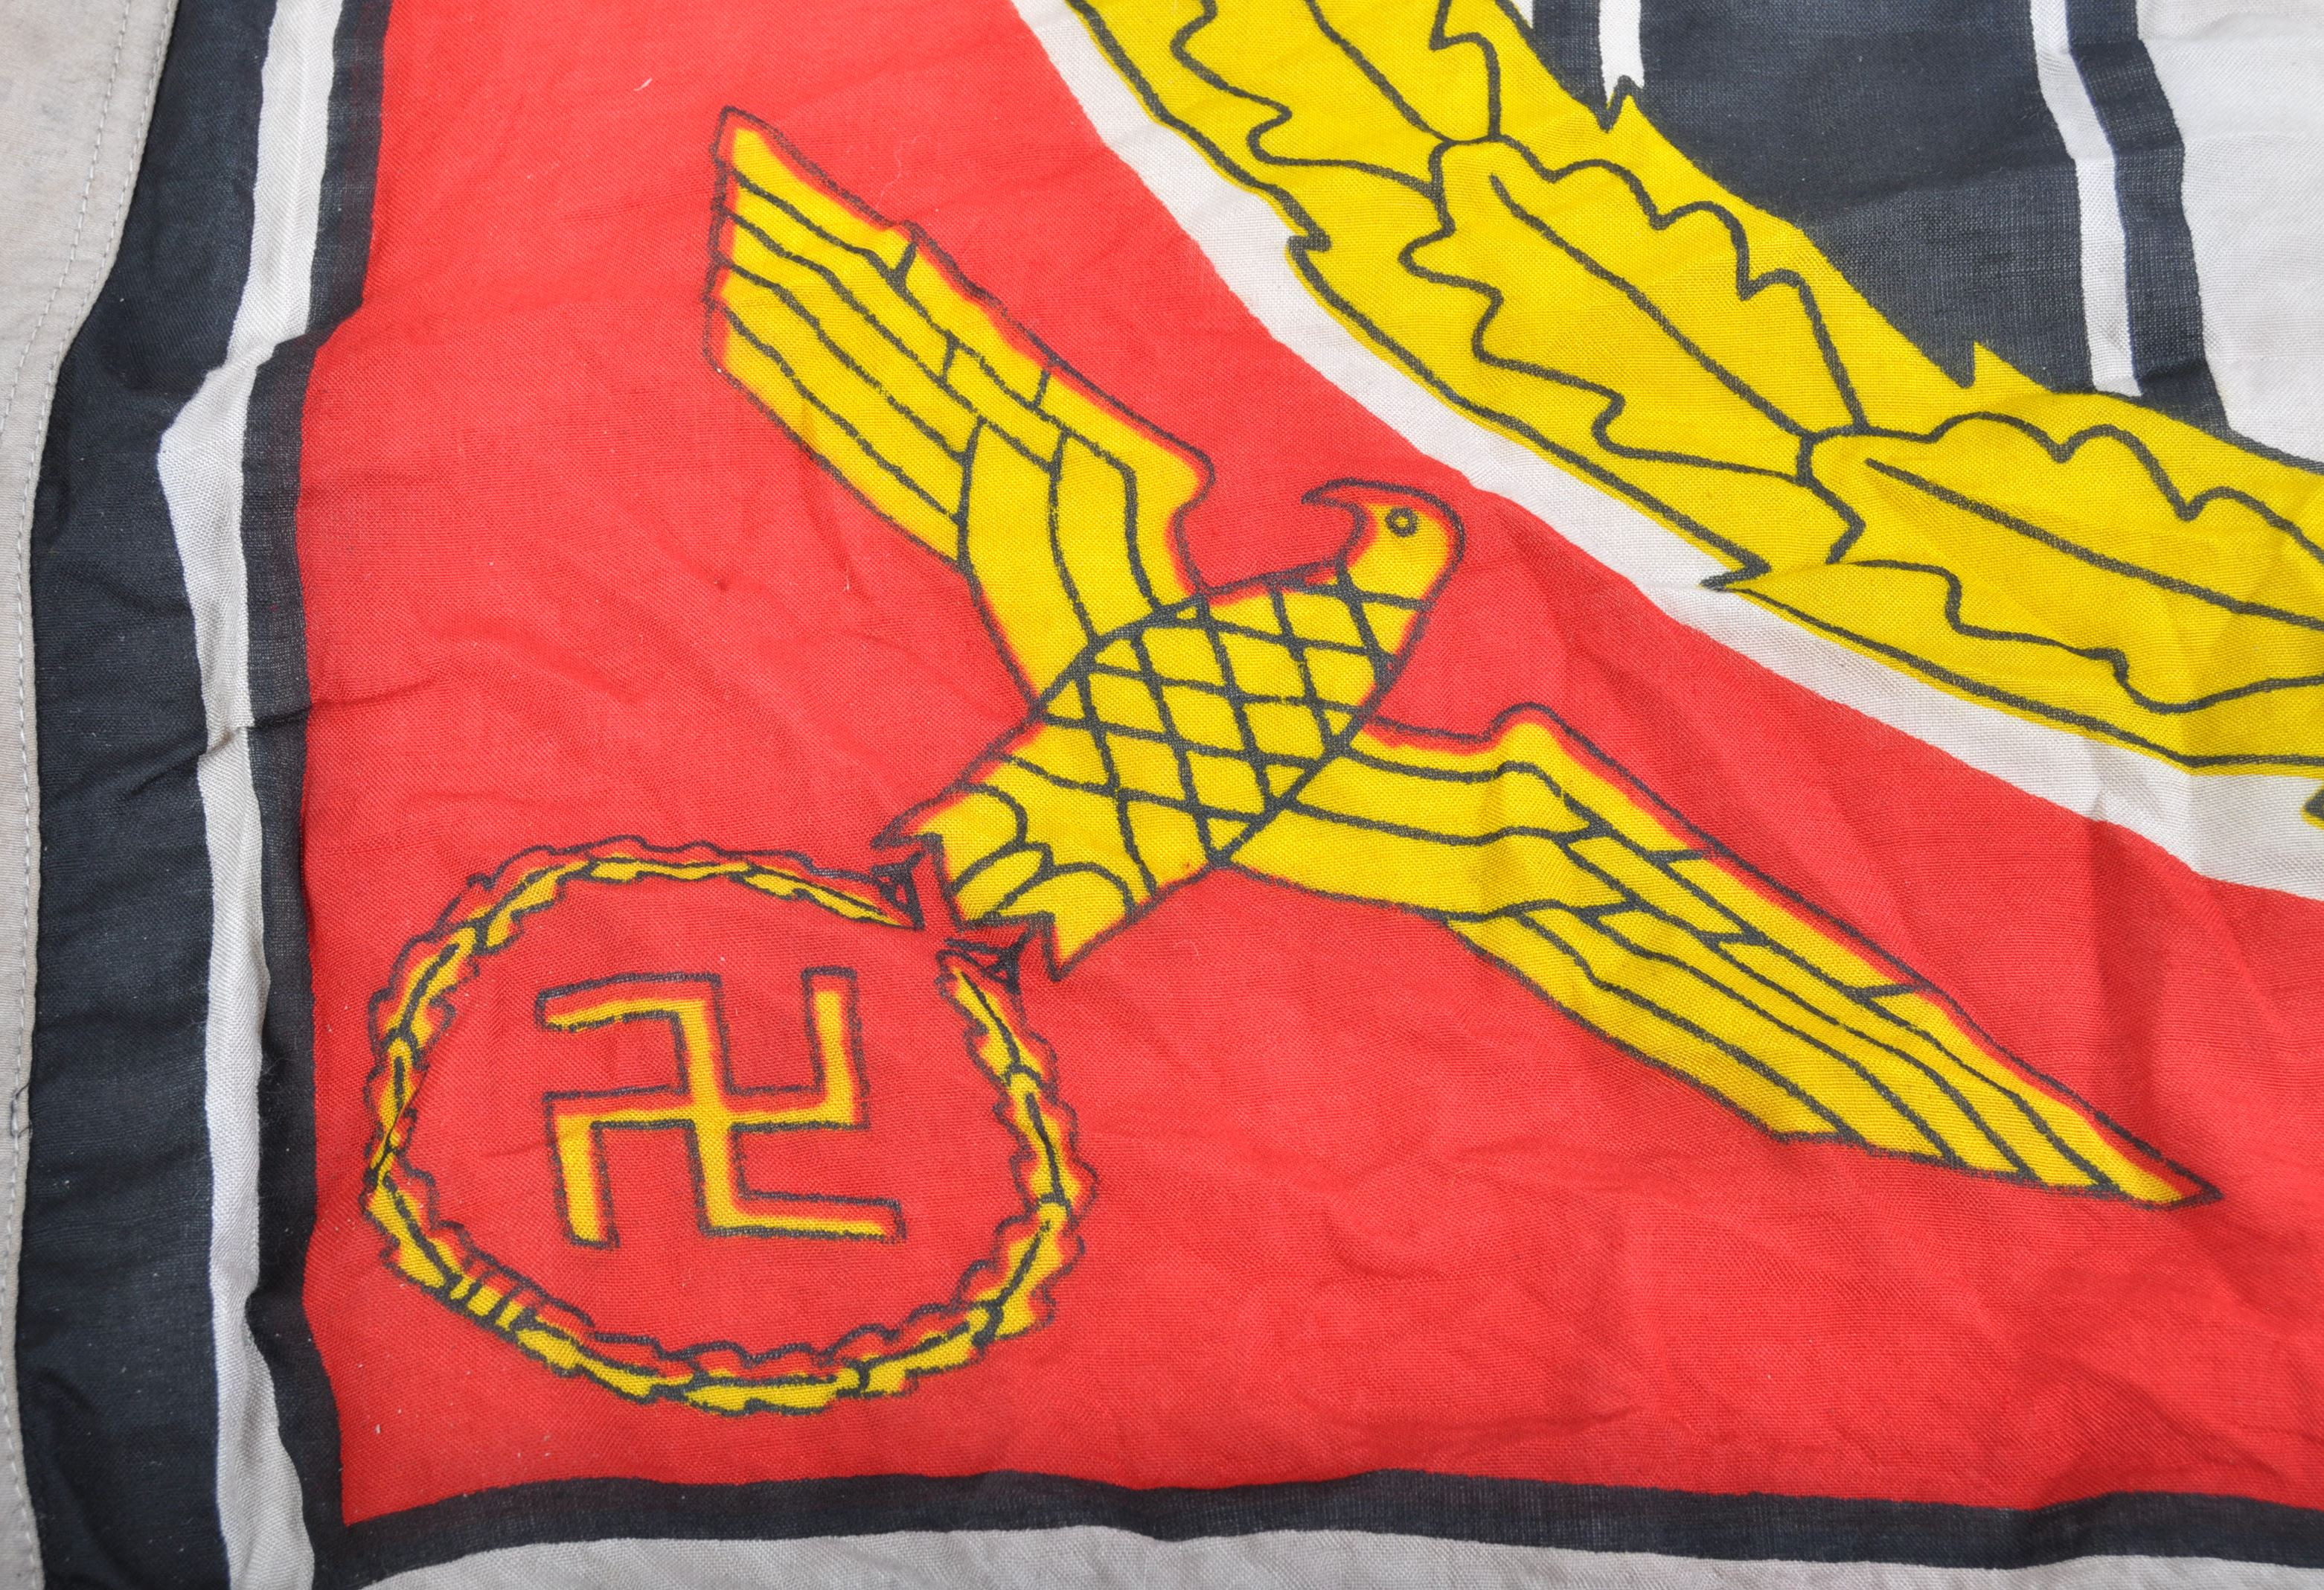 WWII SECOND WORLD WAR FUHRER STANDARD LINEN FLAG - Image 6 of 6